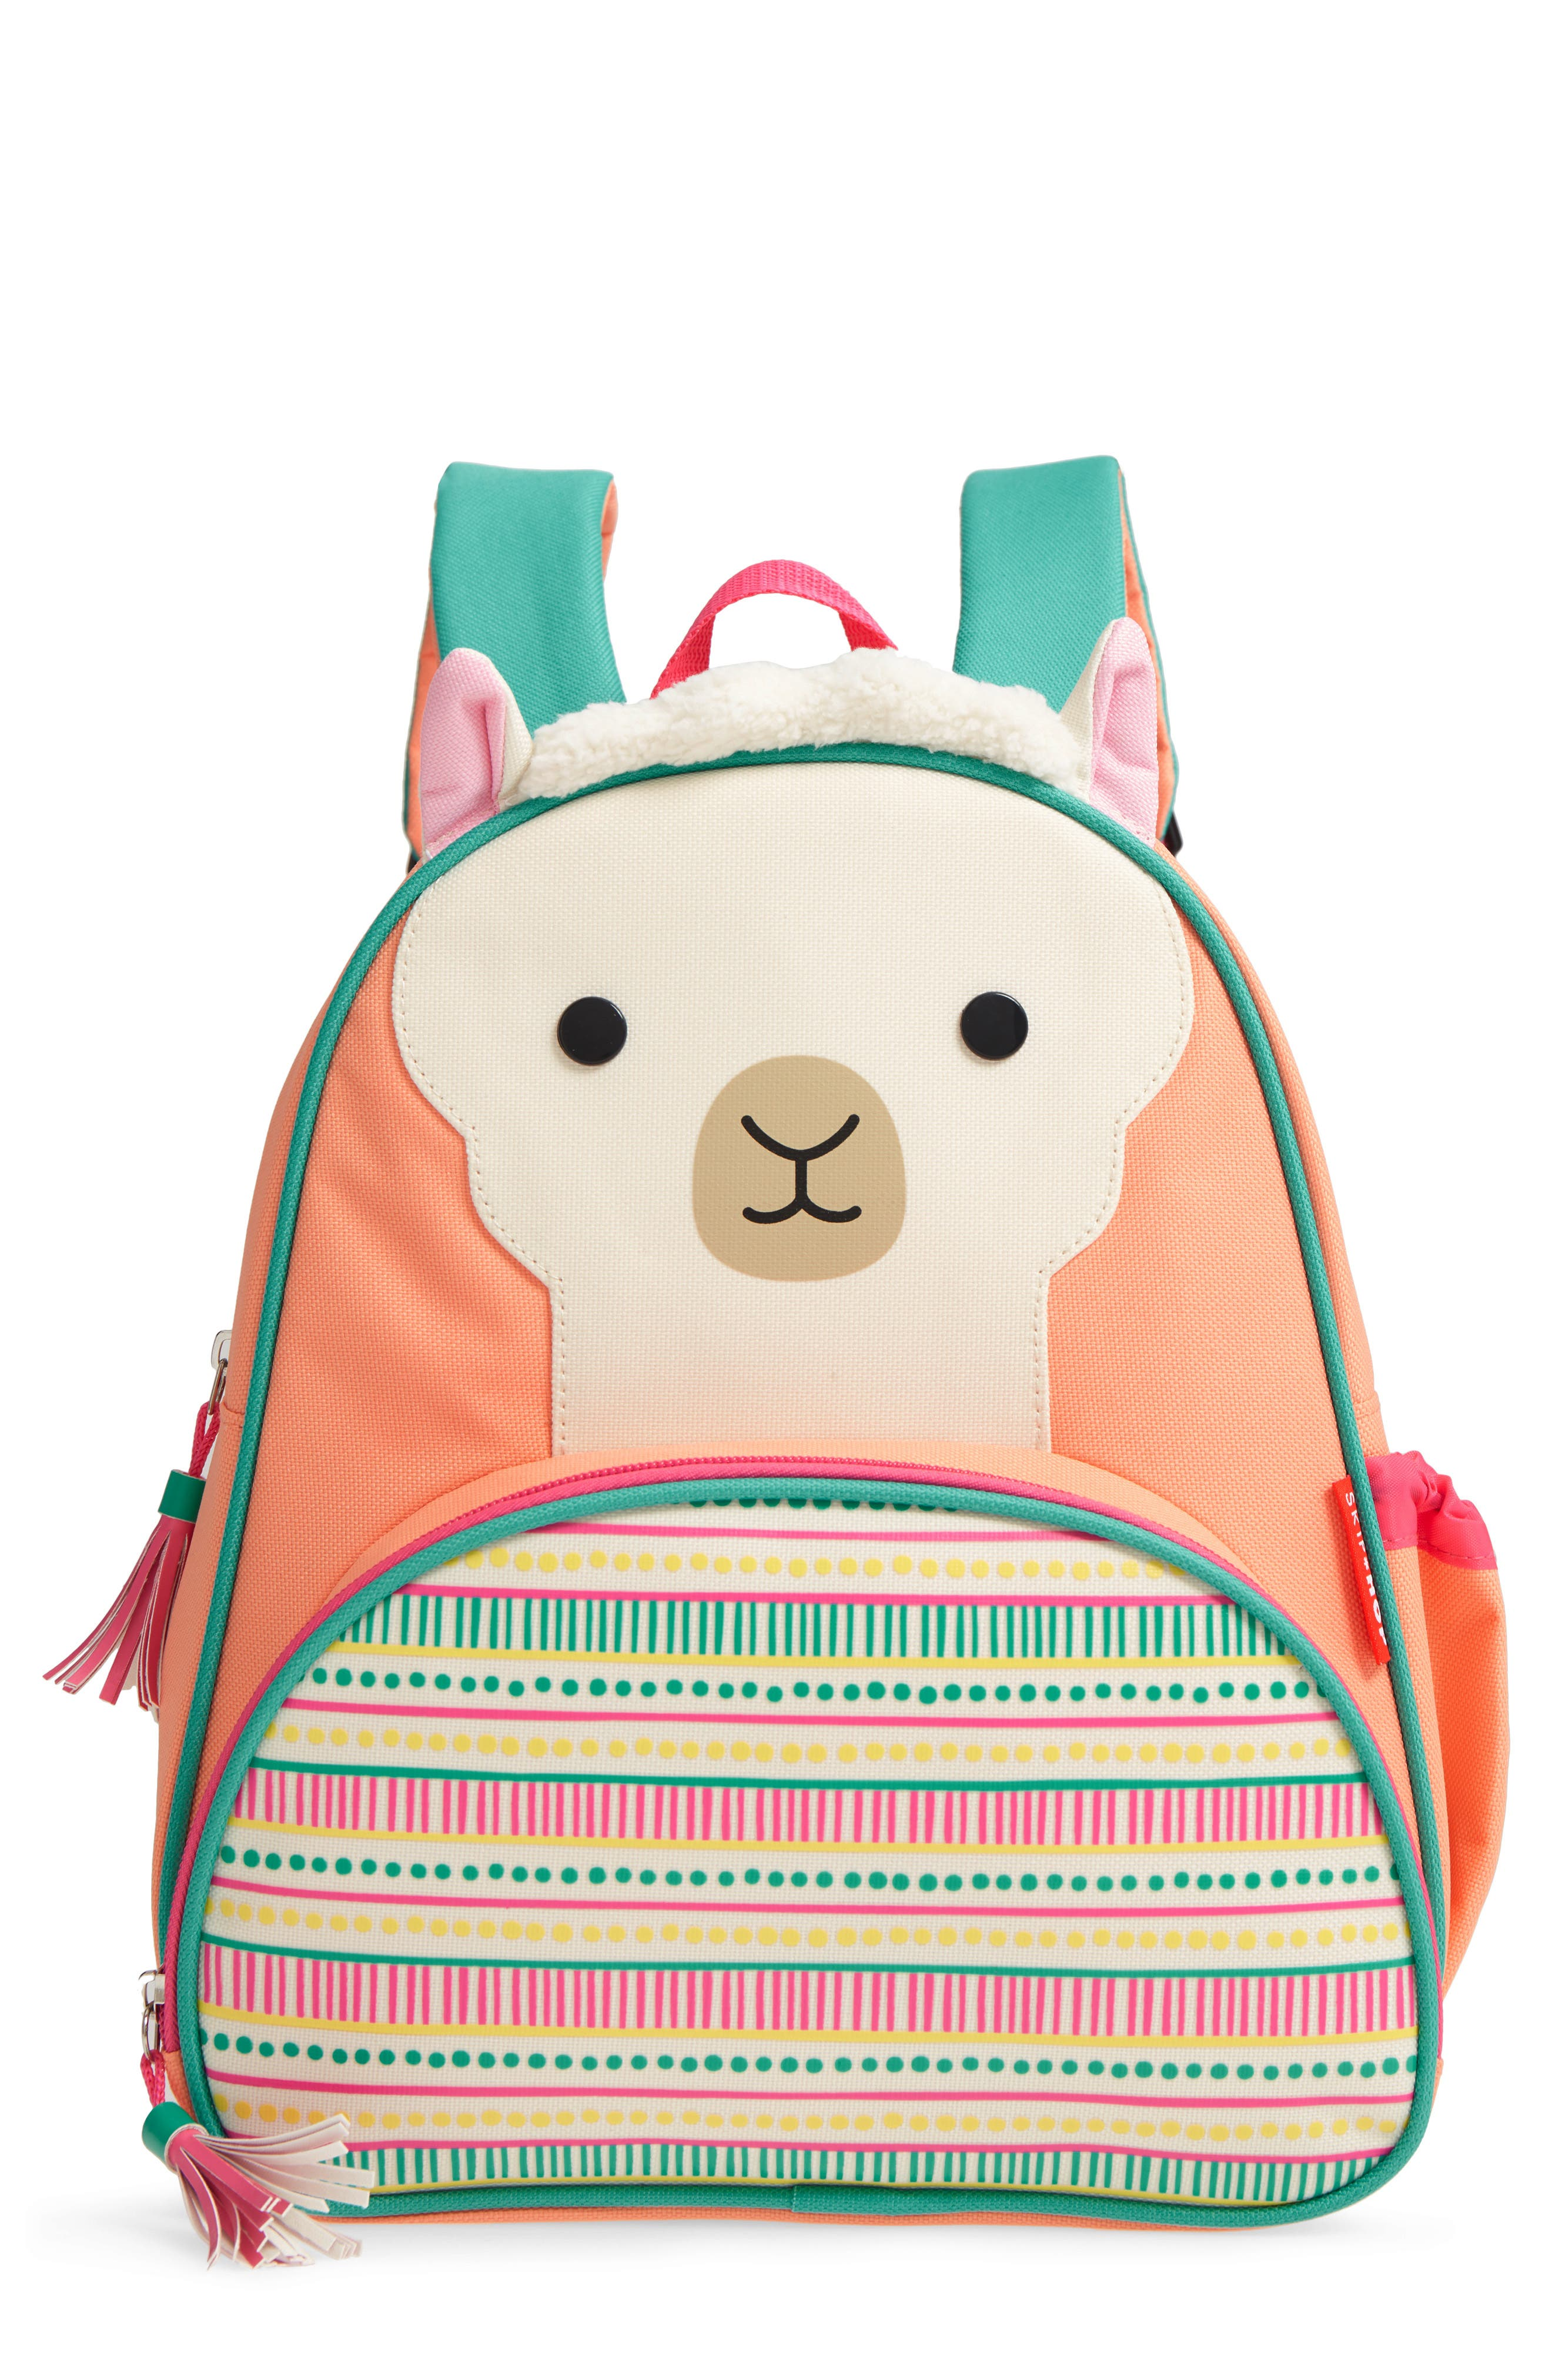 SKIP HOP Zoo Pack Llama Backpack, Main, color, PINK MULTI